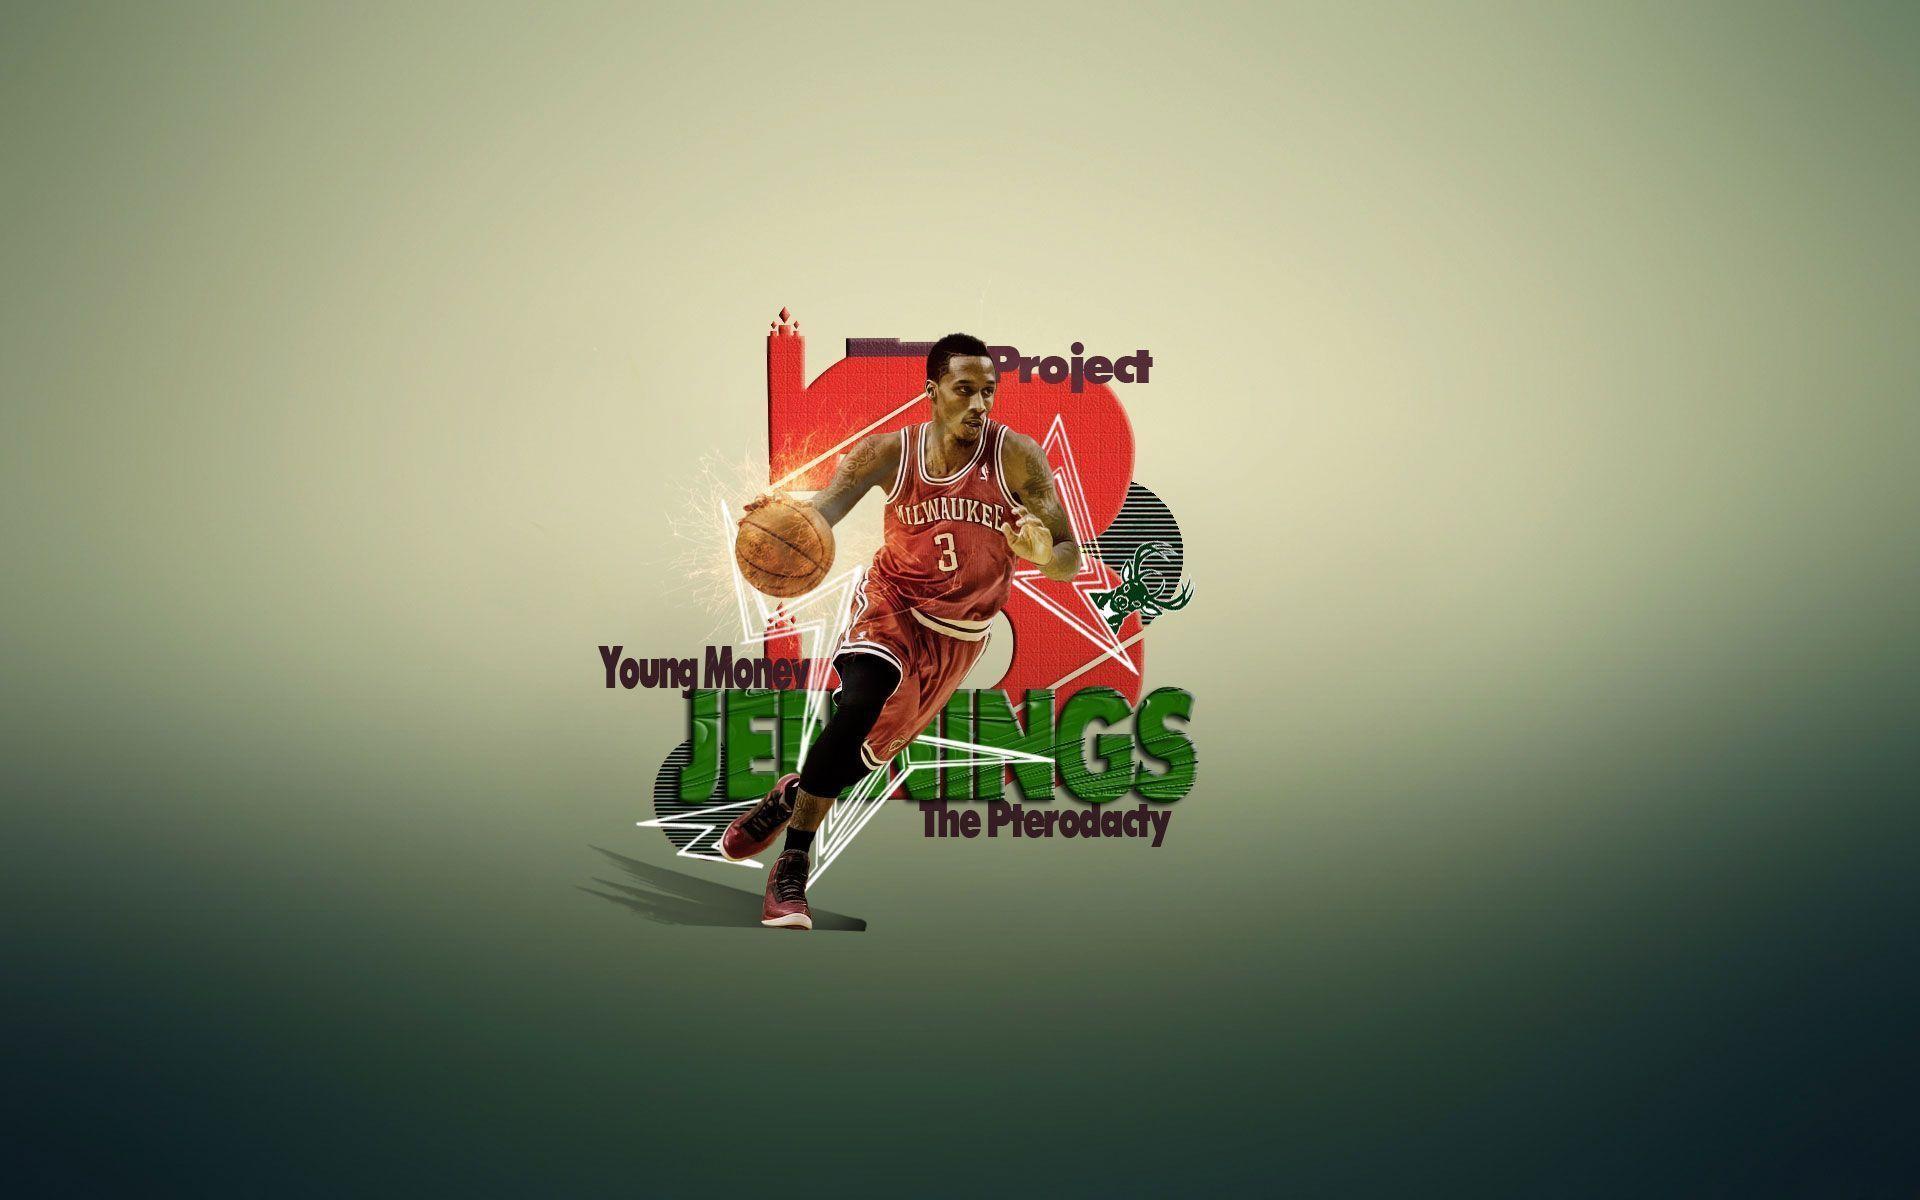 Milwaukee Bucks Wallpapers | Basketball Wallpapers at .